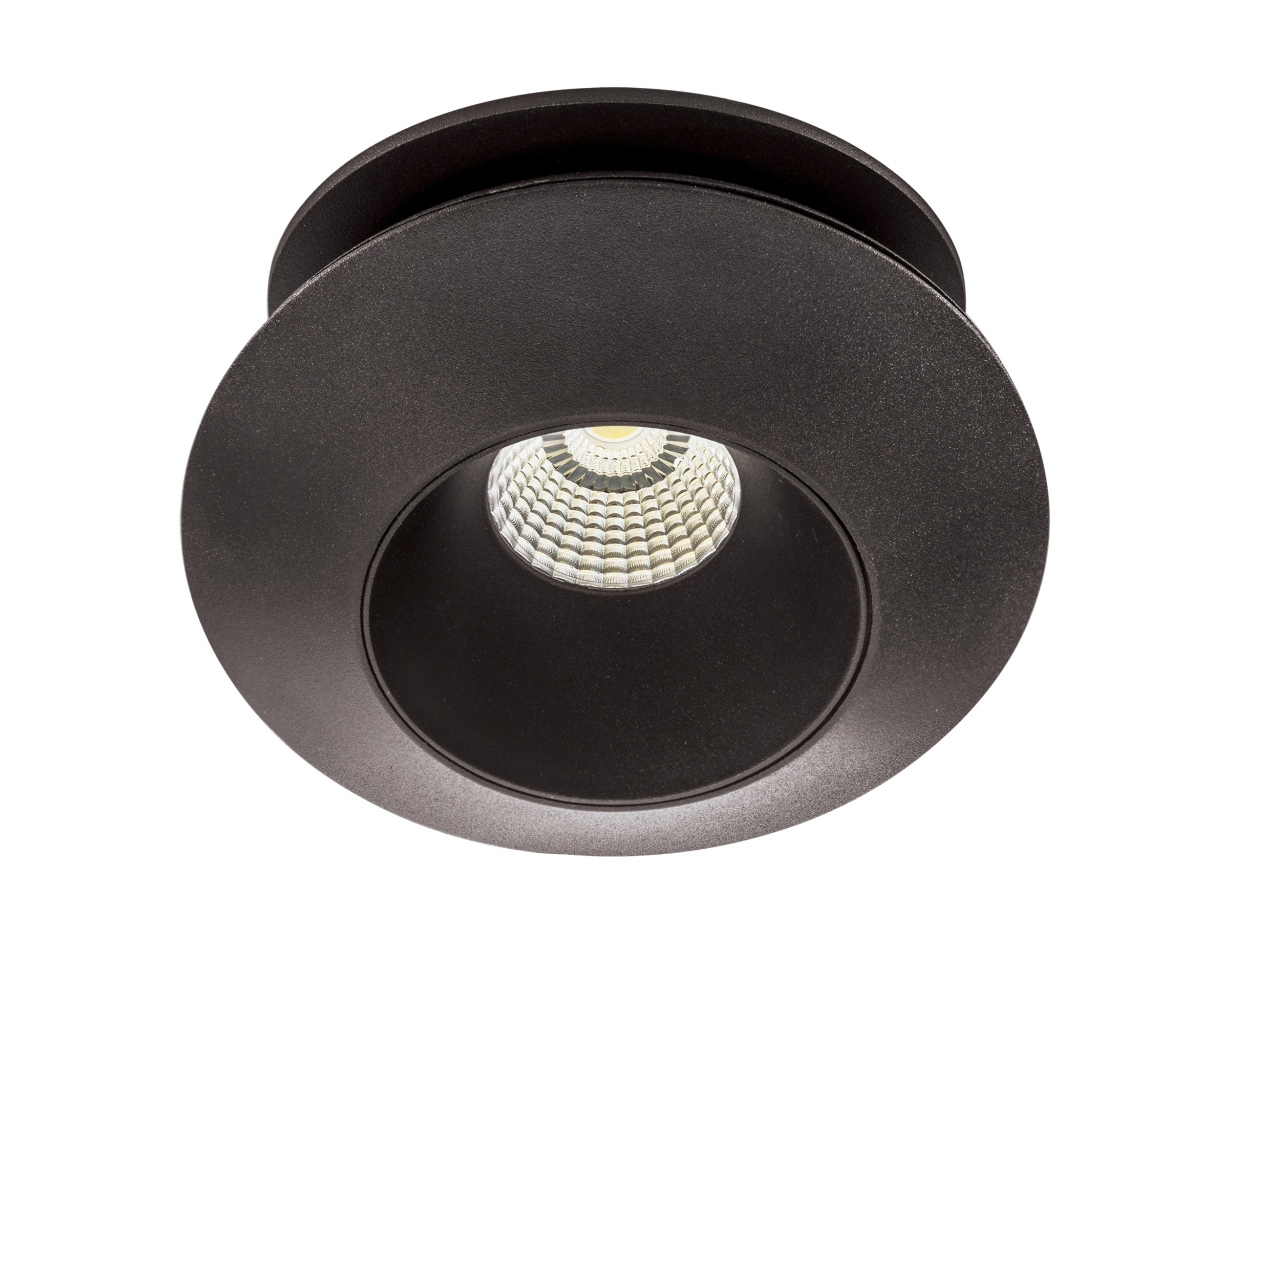 Светильник Orbe LED 15W 1240LM 60G черный 3000K Lightstar 051307